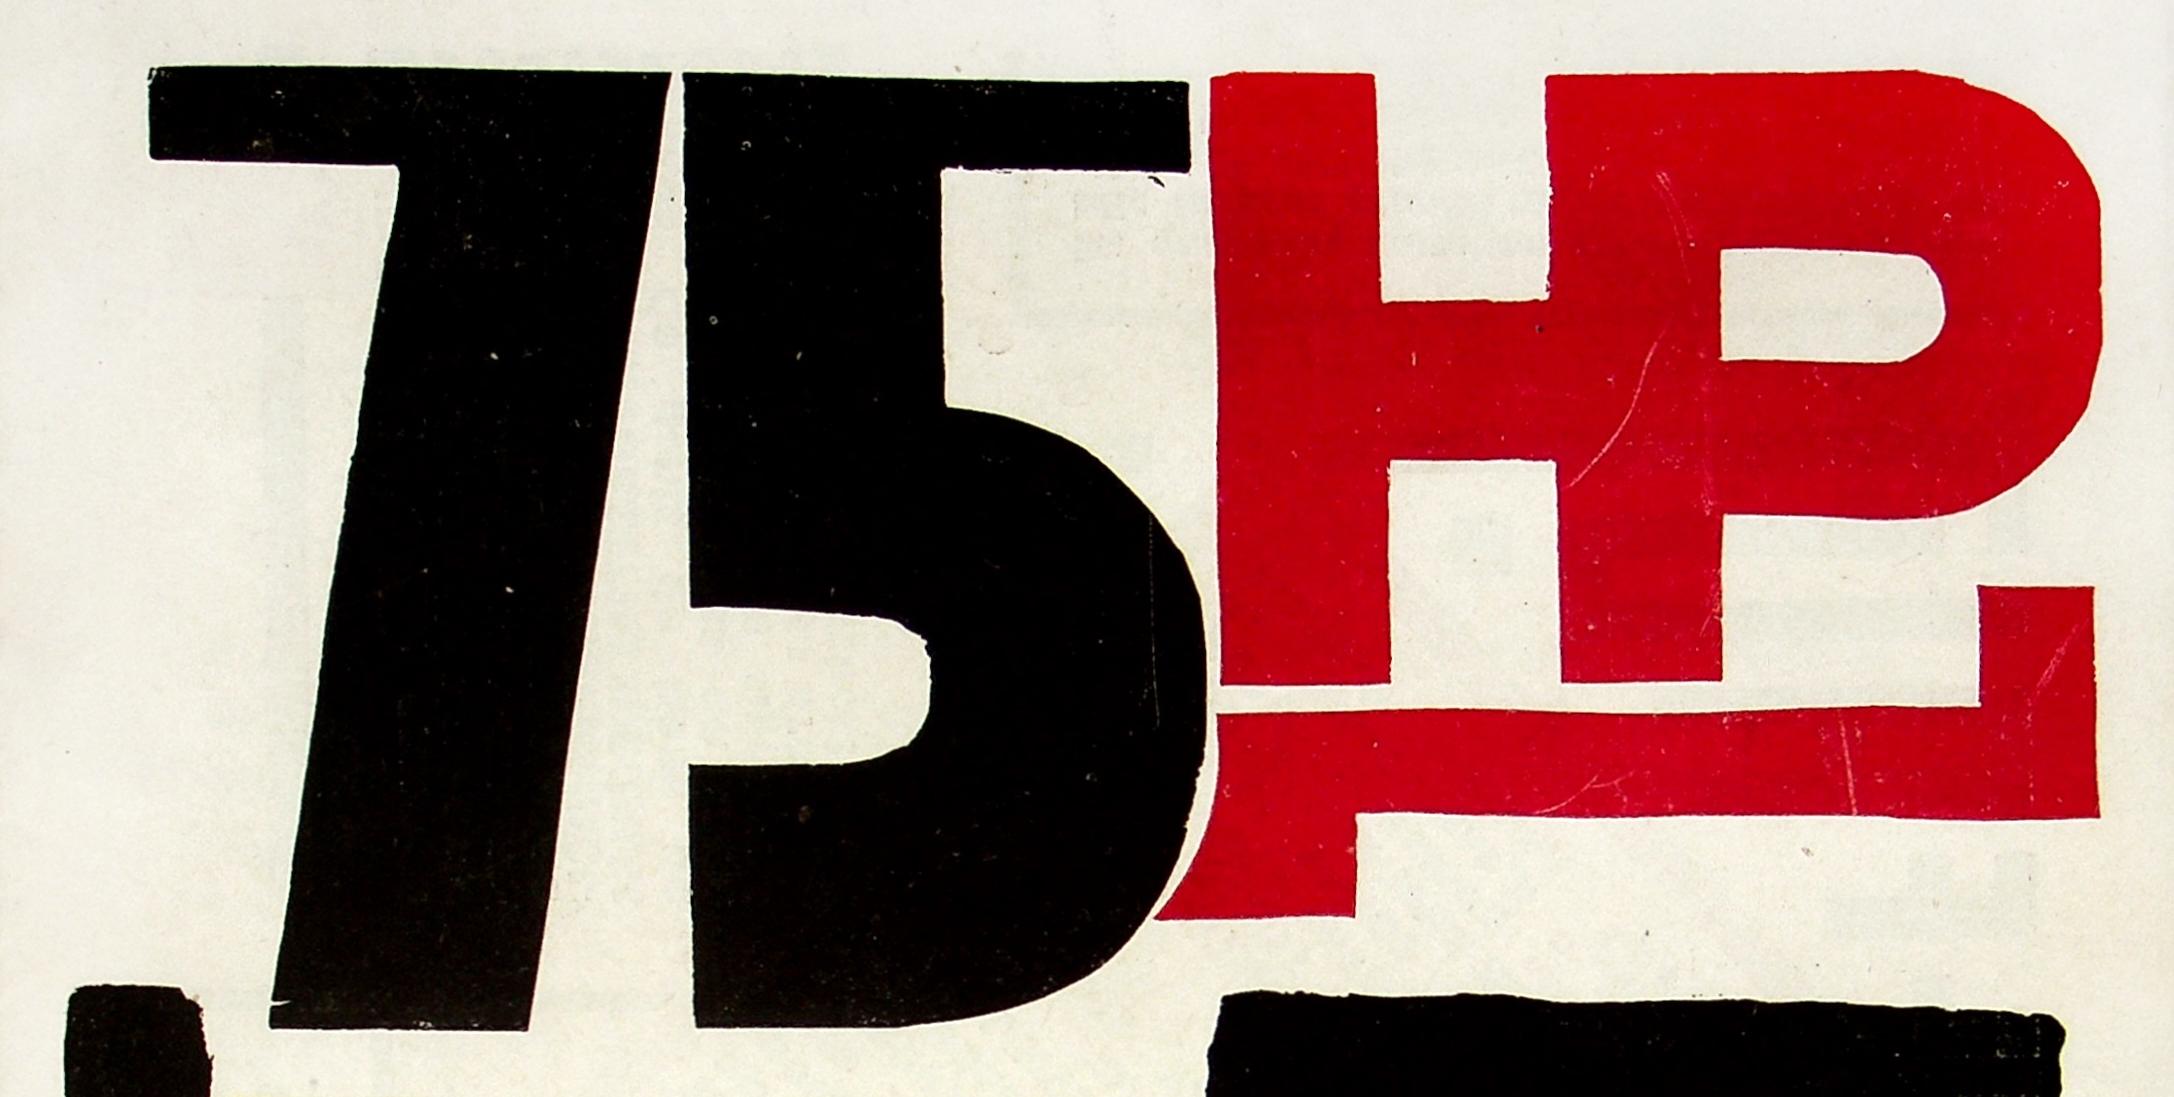 75HP (head)